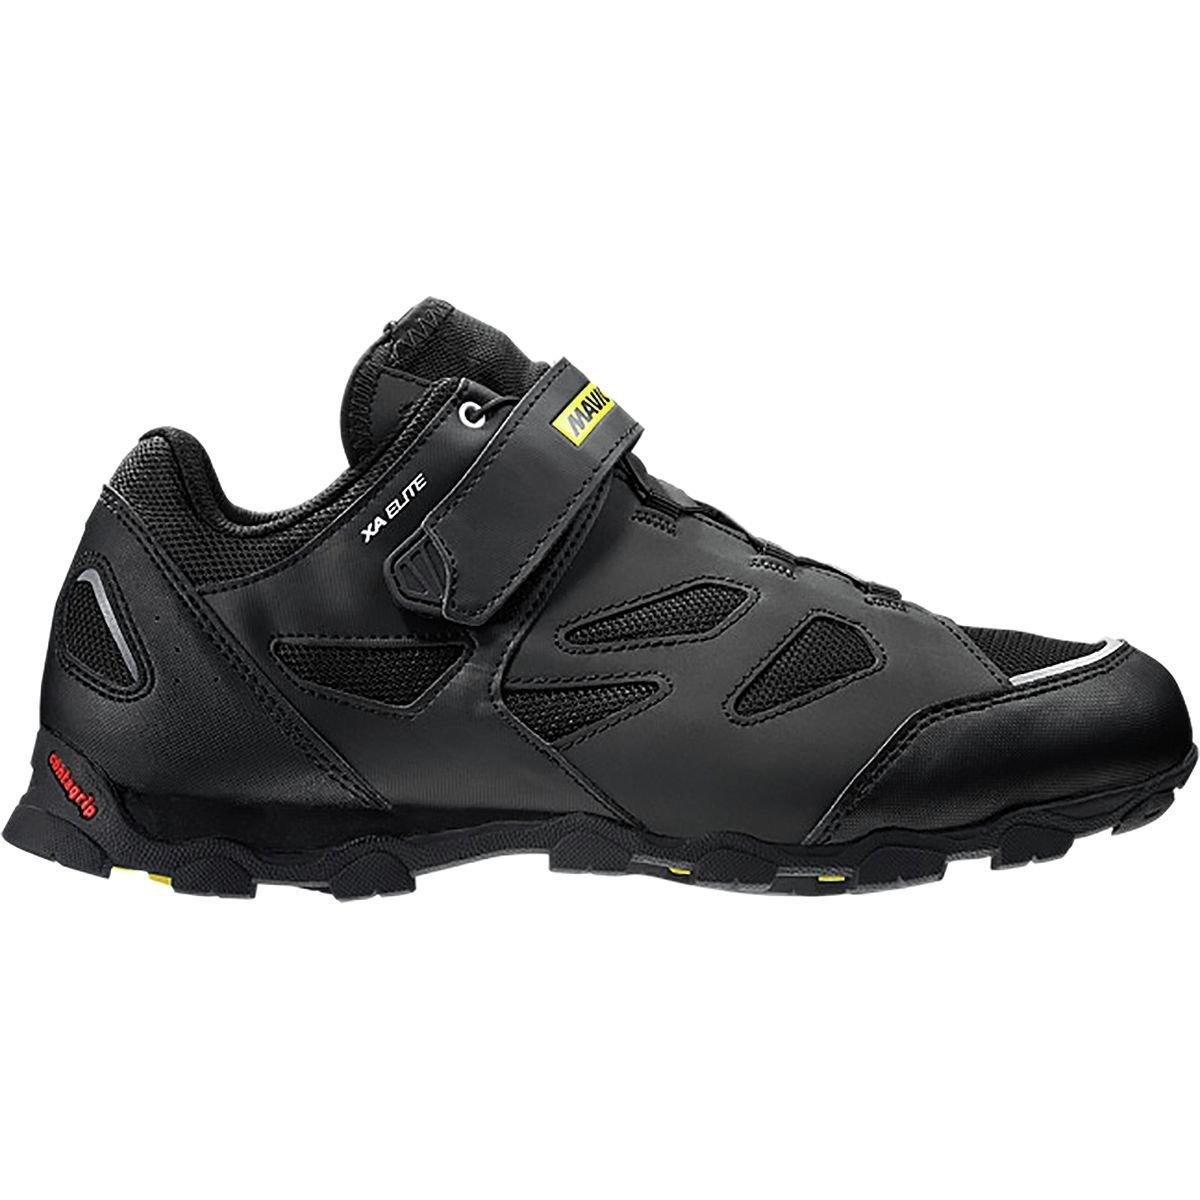 Mavic XA Elite Cycling Shoes - Men's Black/Black 10.0 UK/10.5 US by Mavic